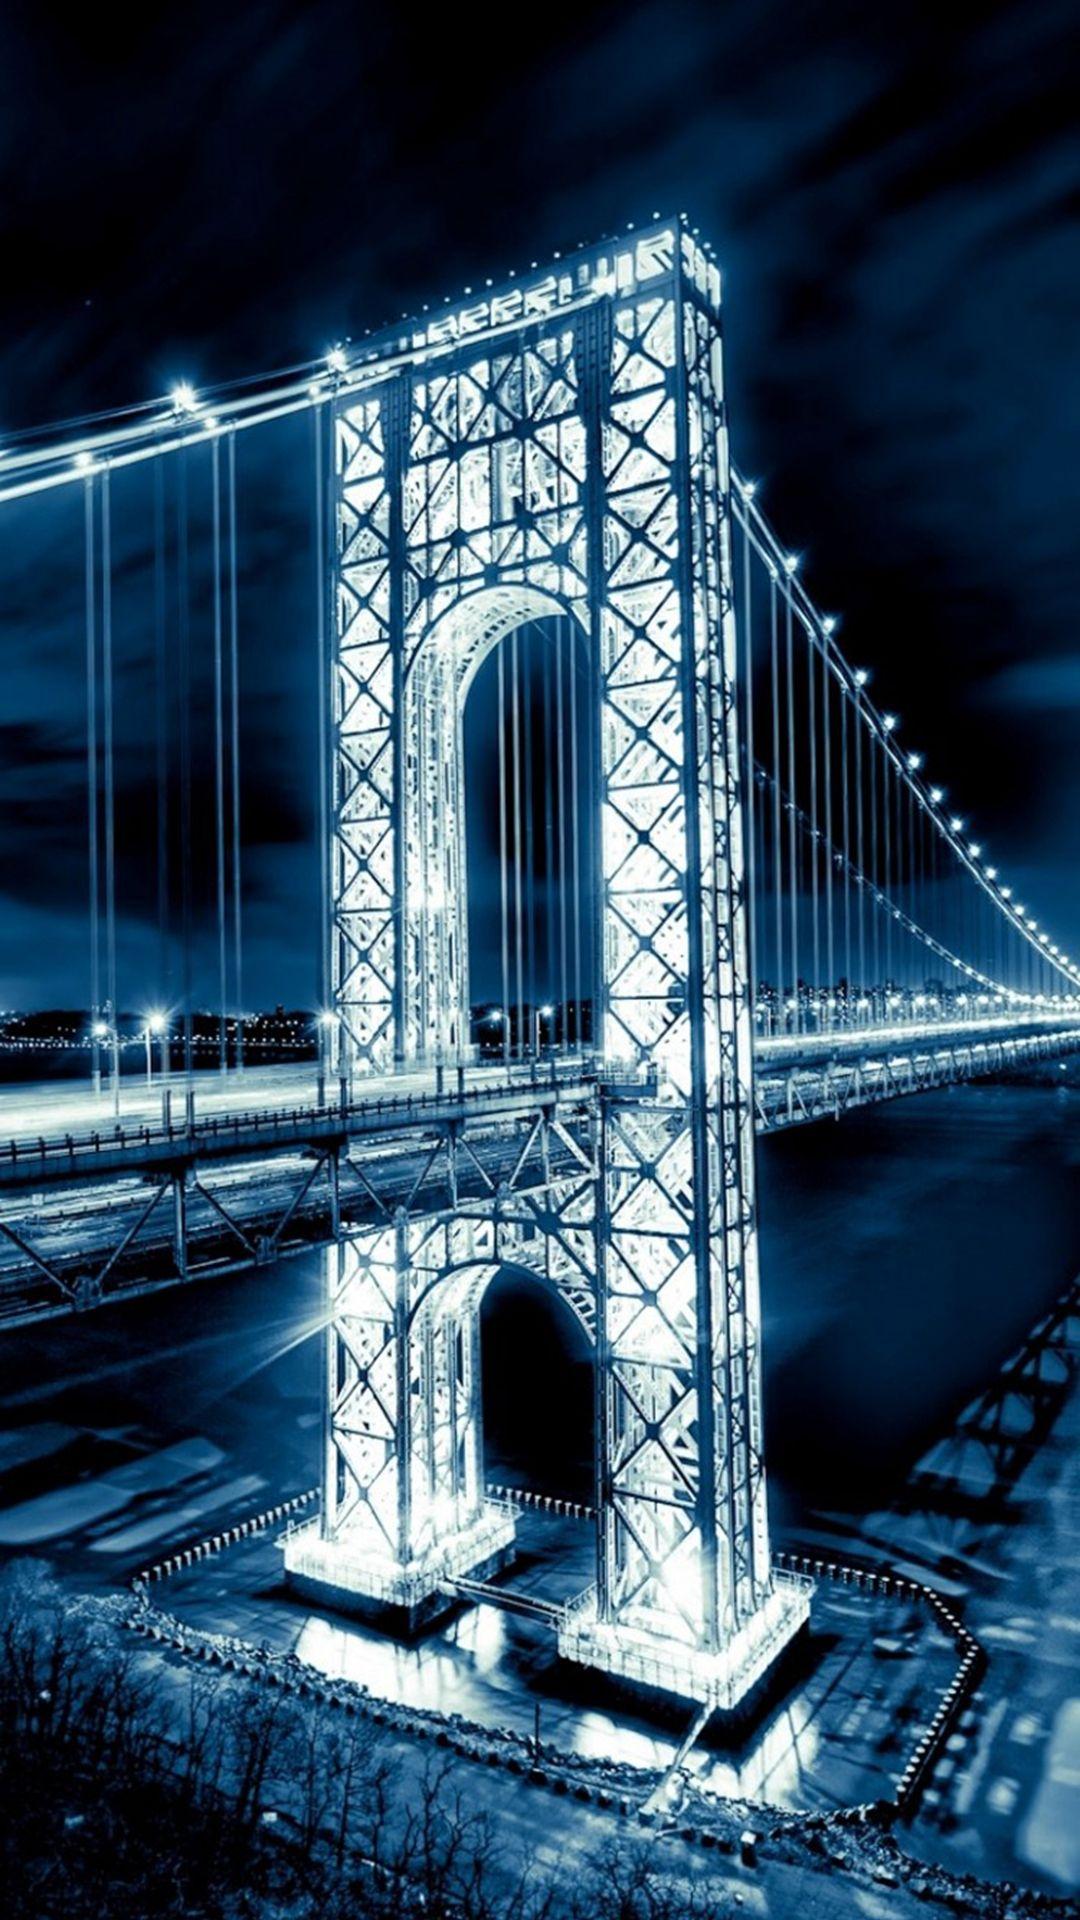 Night Shiny Long Bridge Nature Landscape iPhone 6 plus 1080x1920